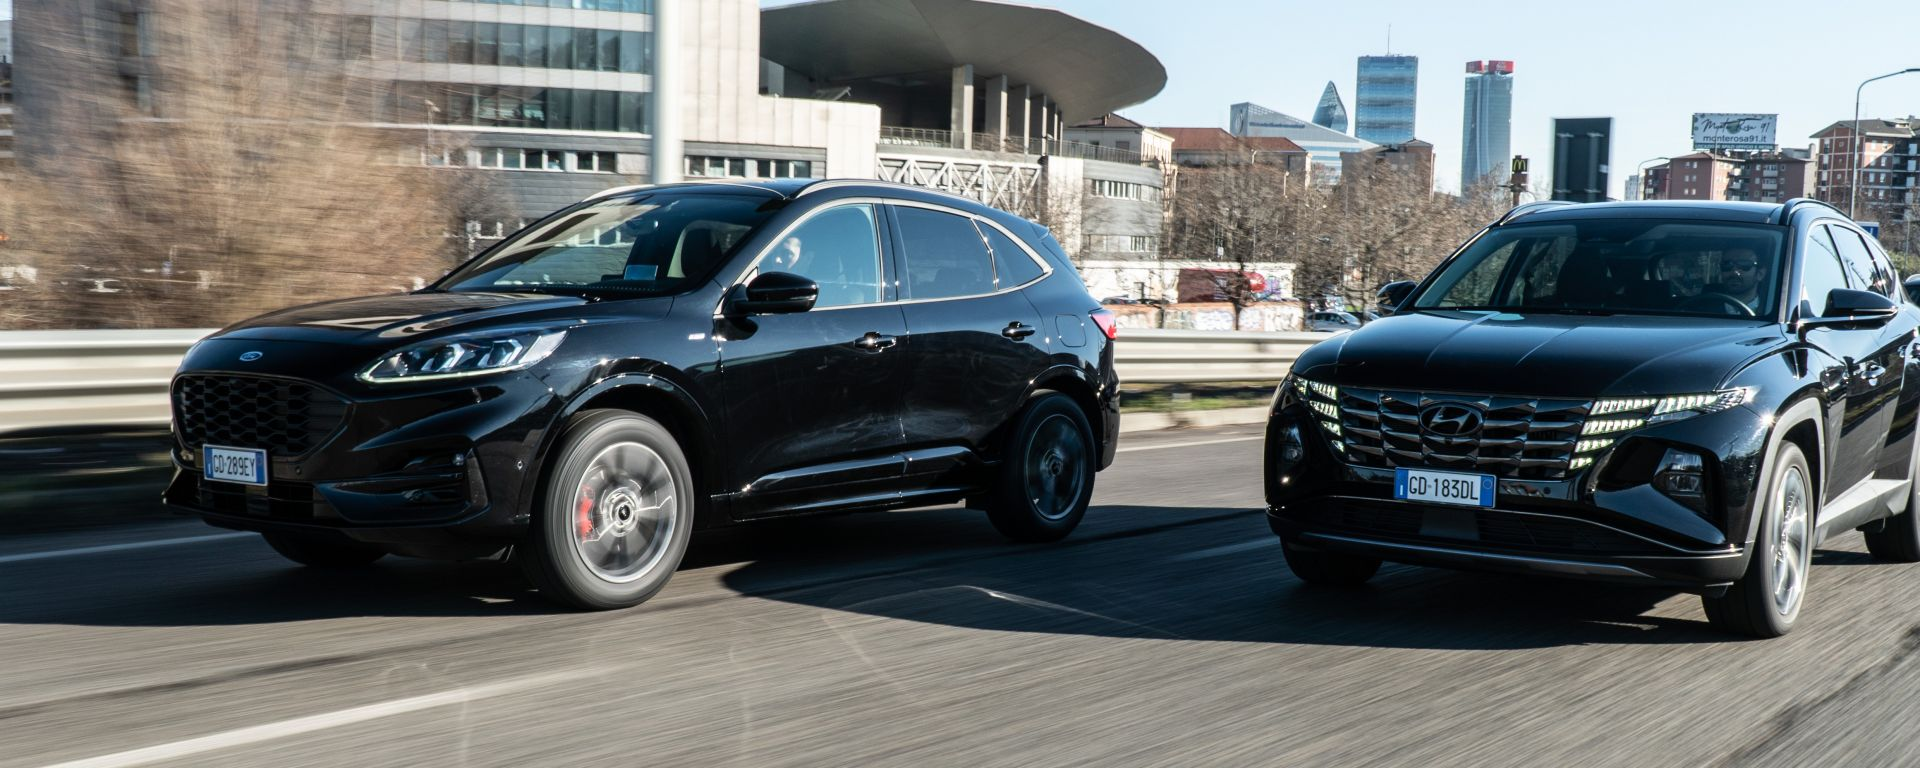 Comparativa Ford Kuga vs Hyundai Tucson: SUV full-hybrid a confronto